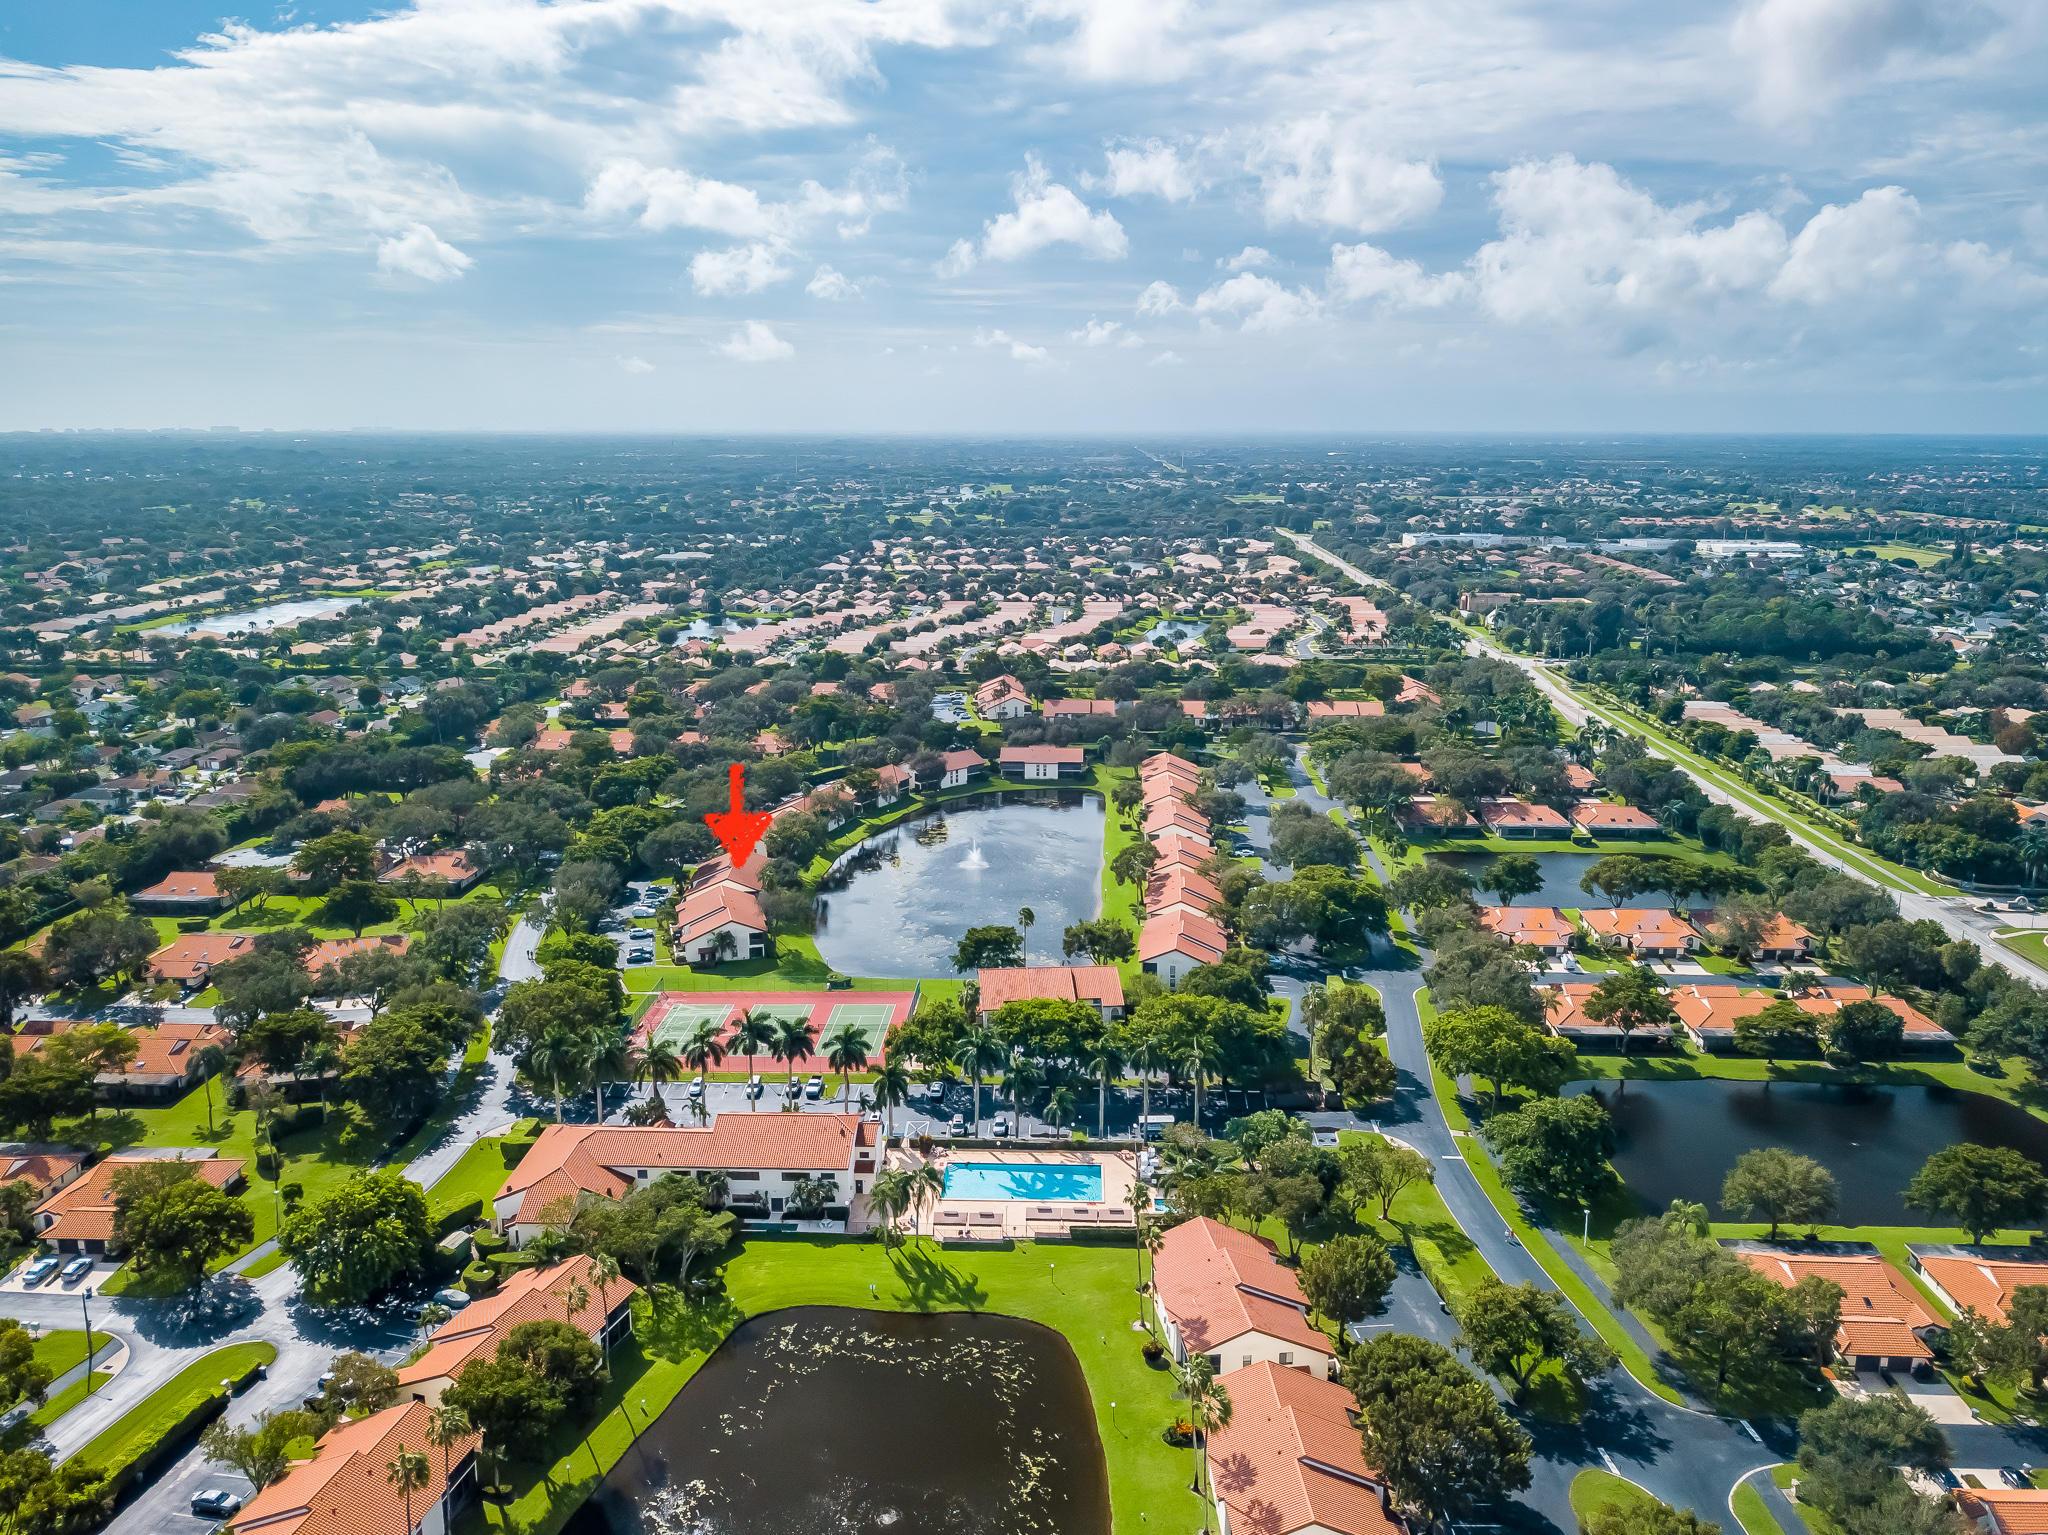 10439 Circle Lake Drive, Boynton Beach, Florida 33437, 3 Bedrooms Bedrooms, ,2 BathroomsBathrooms,Residential,For Sale,Circle Lake,RX-10669131